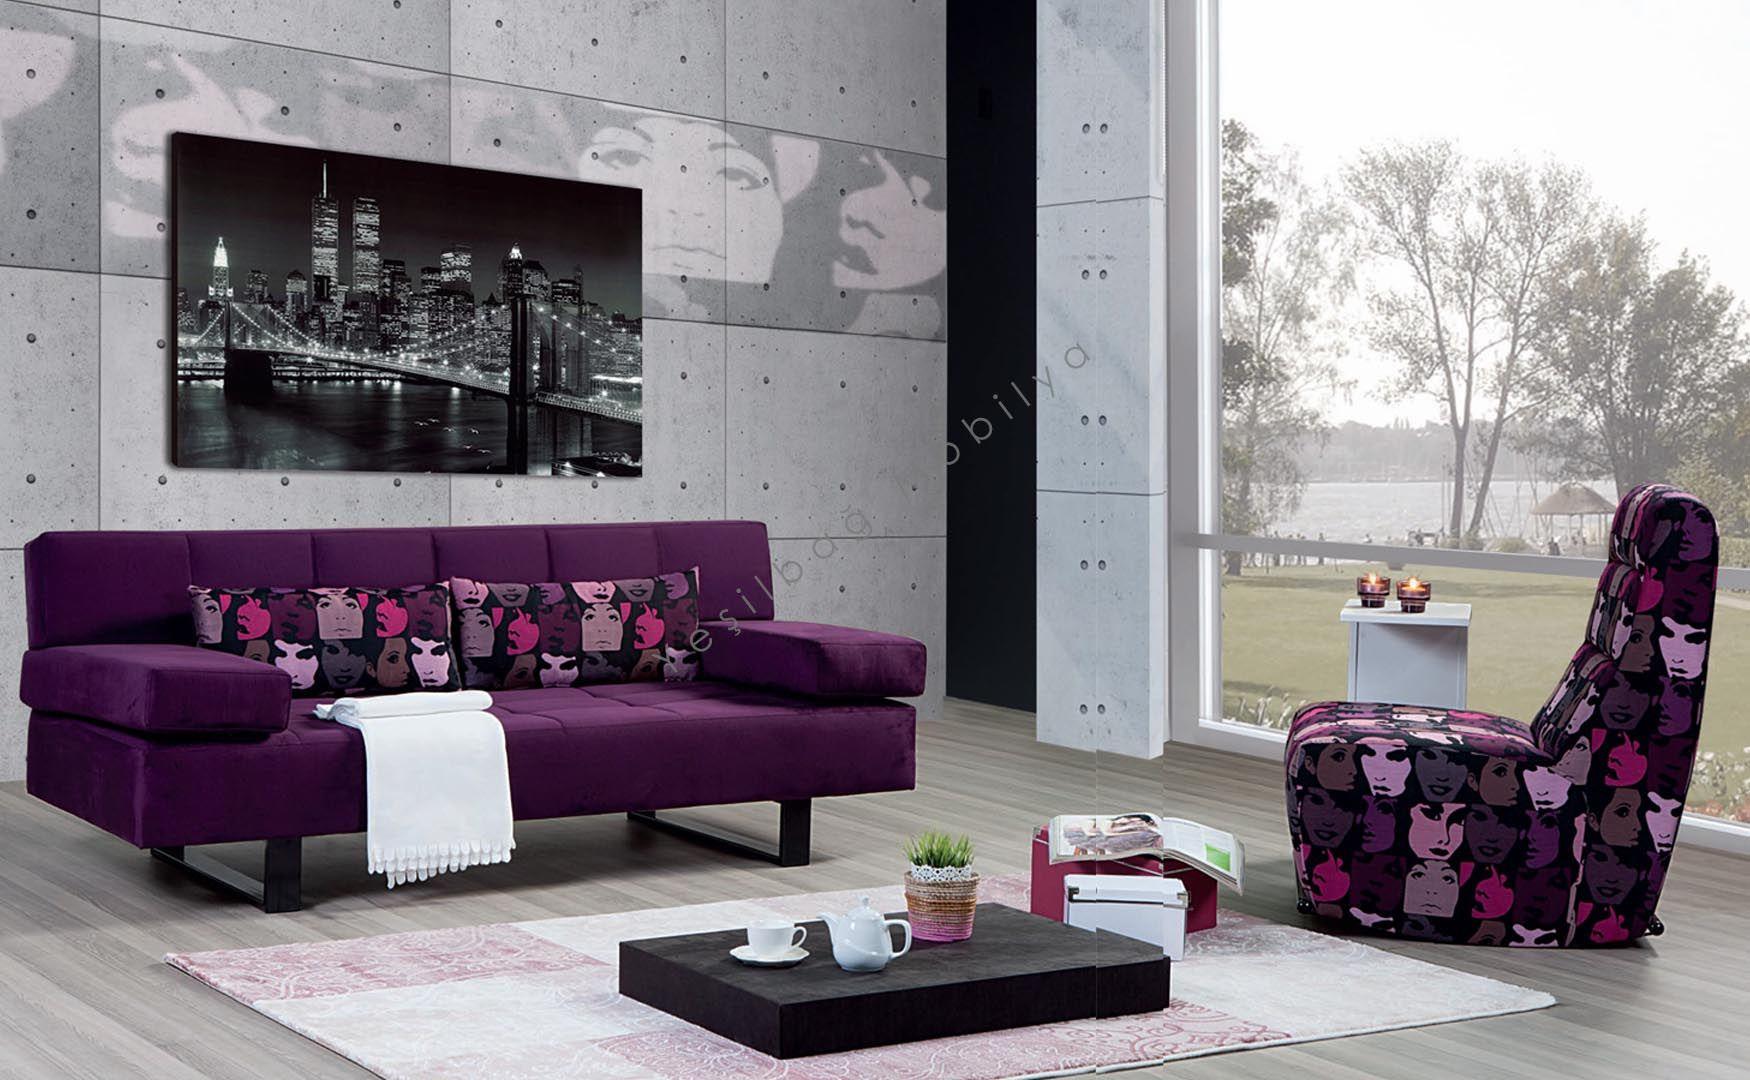 Costa Koltuk Takimi Http Www Yesilbagmobilya Com Tr Costa Koltuk Takimi Pr 4580 Html Furniture Home Decor Home